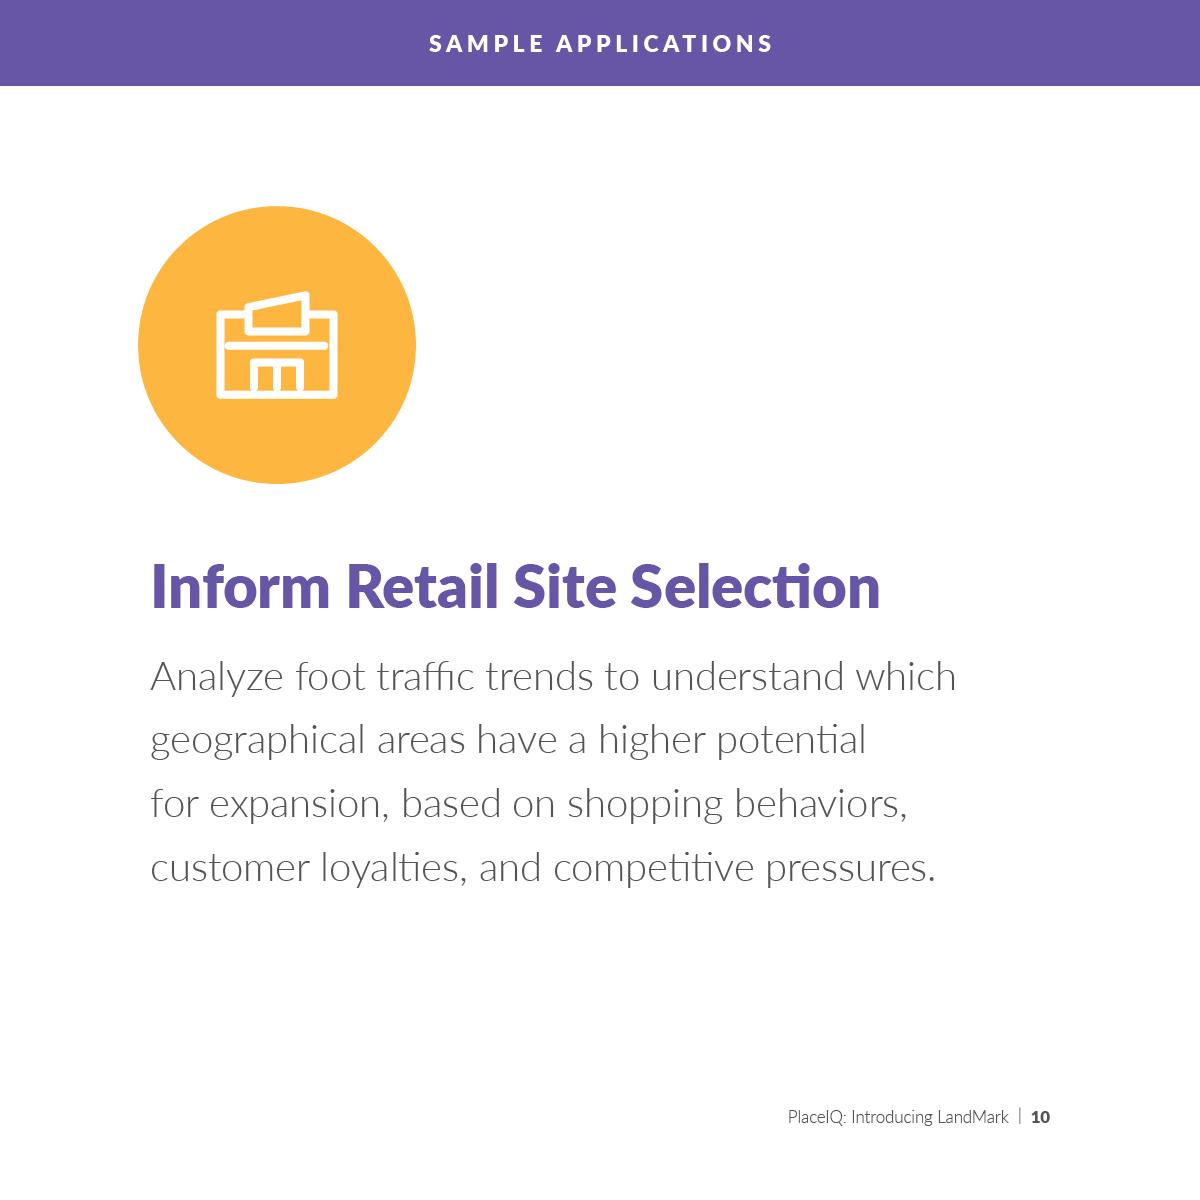 Inform Retail Site Selection